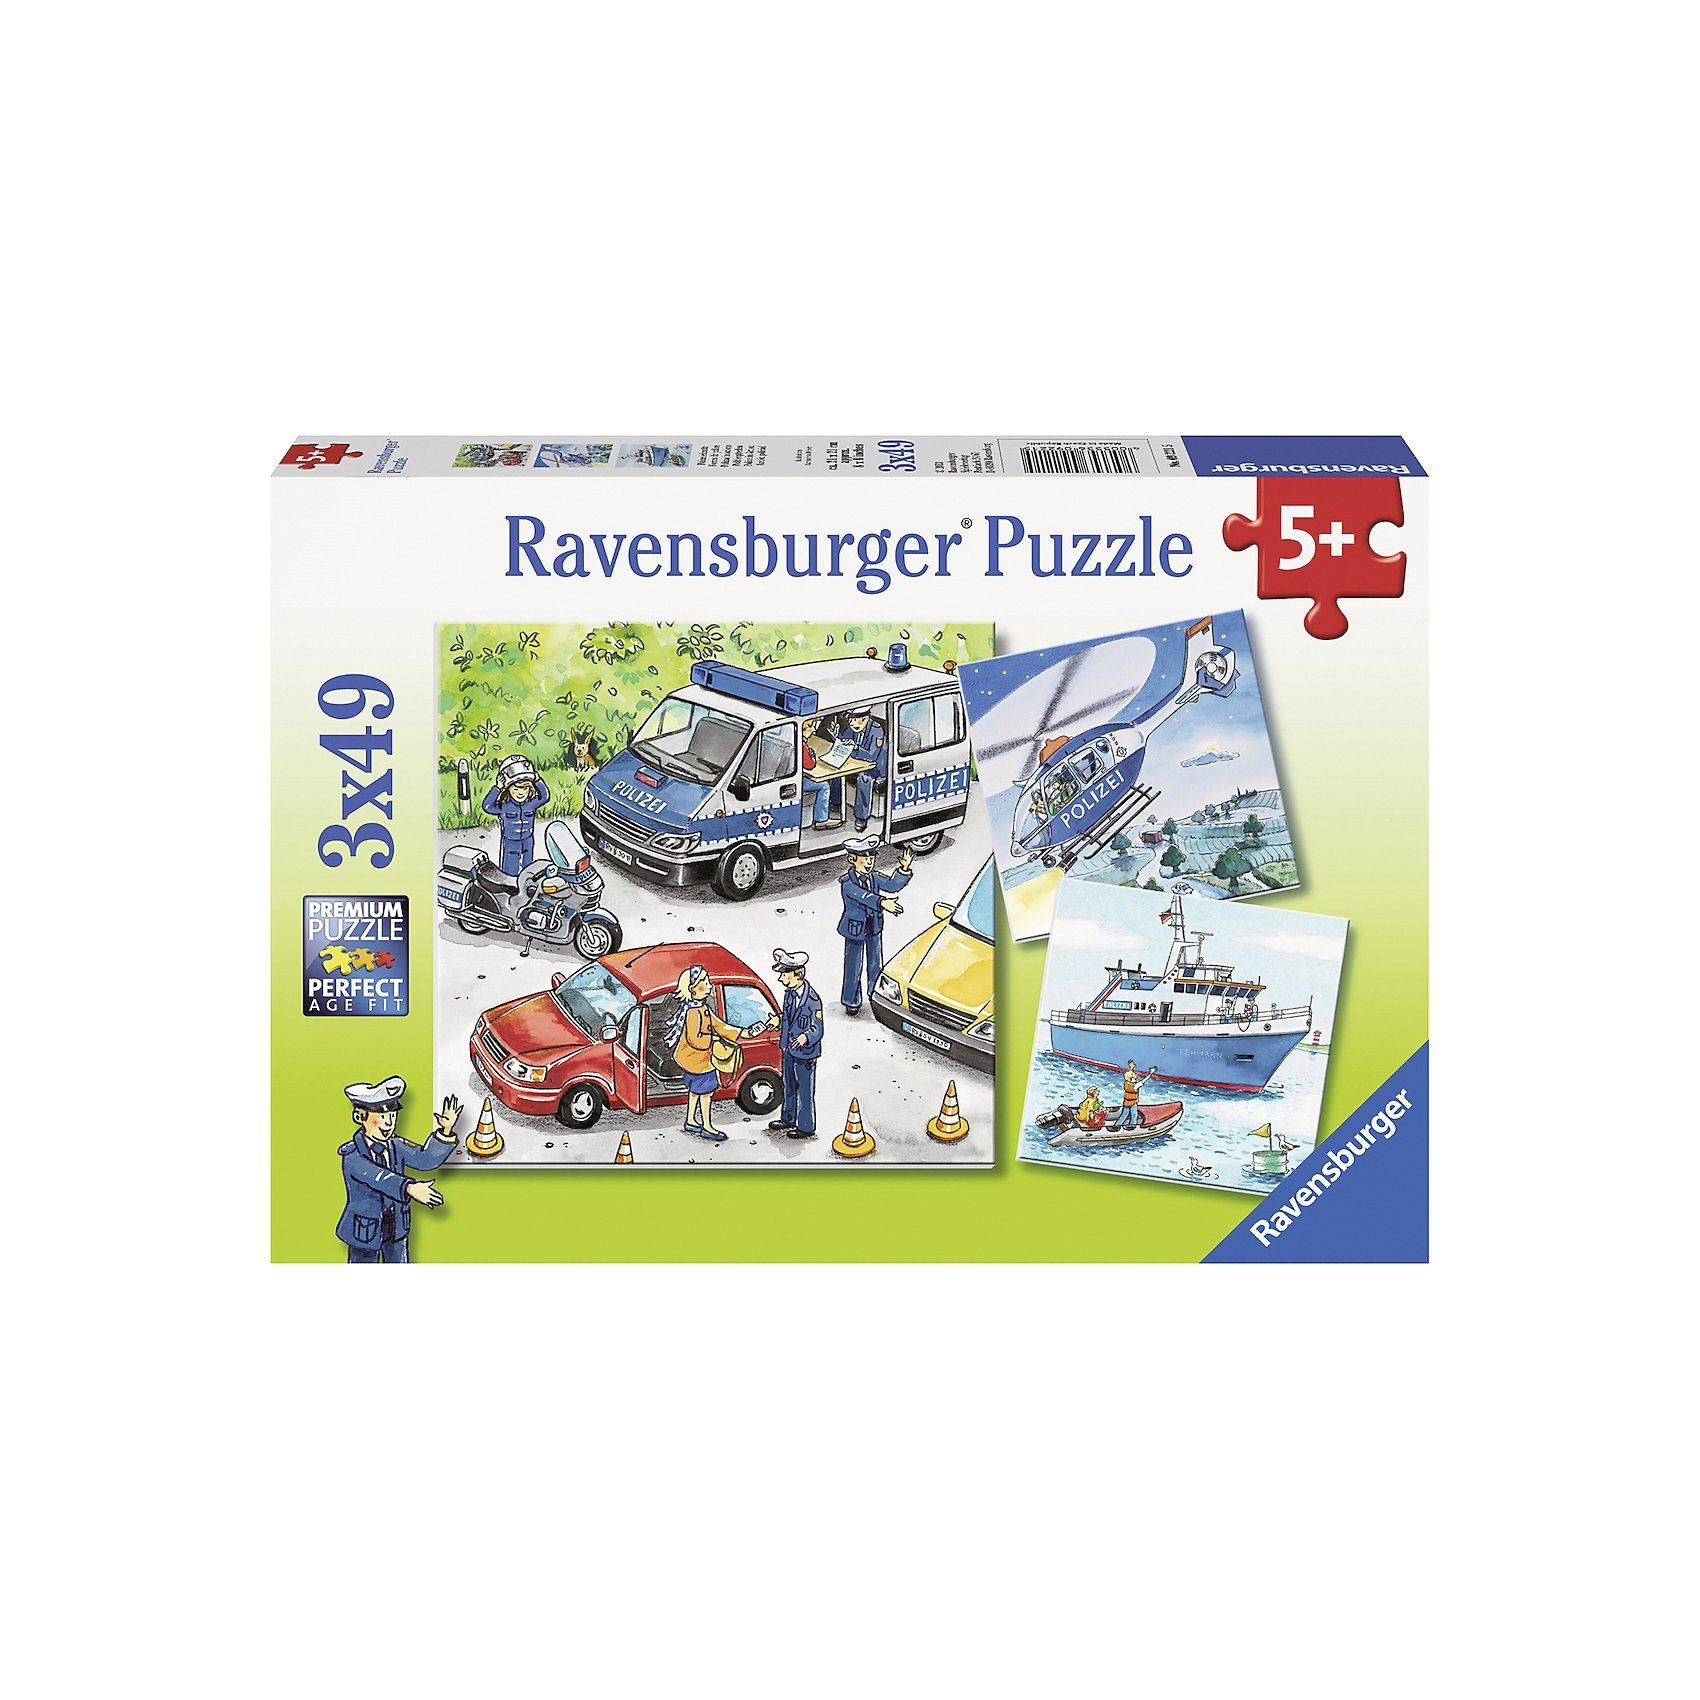 Ravensburger Puzzle-Set - 3 x 49 Teile- Polizeieinsatz